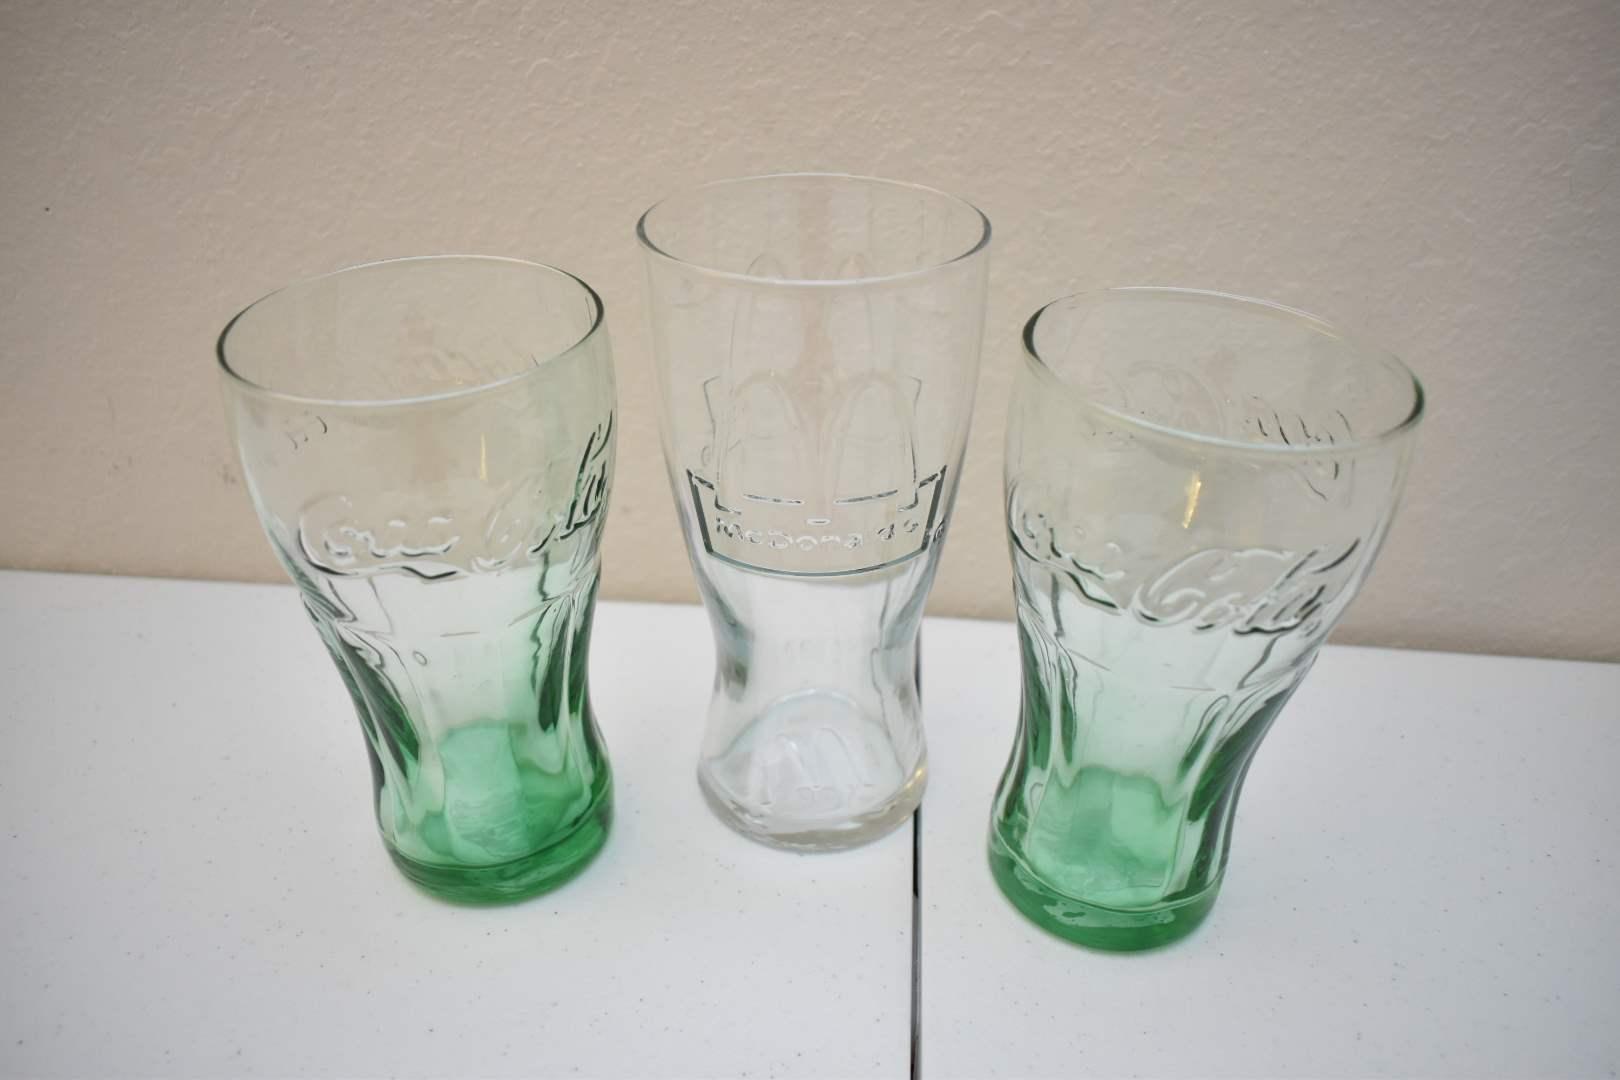 Vintage McDonald's and Coca-Cola Glass Cups